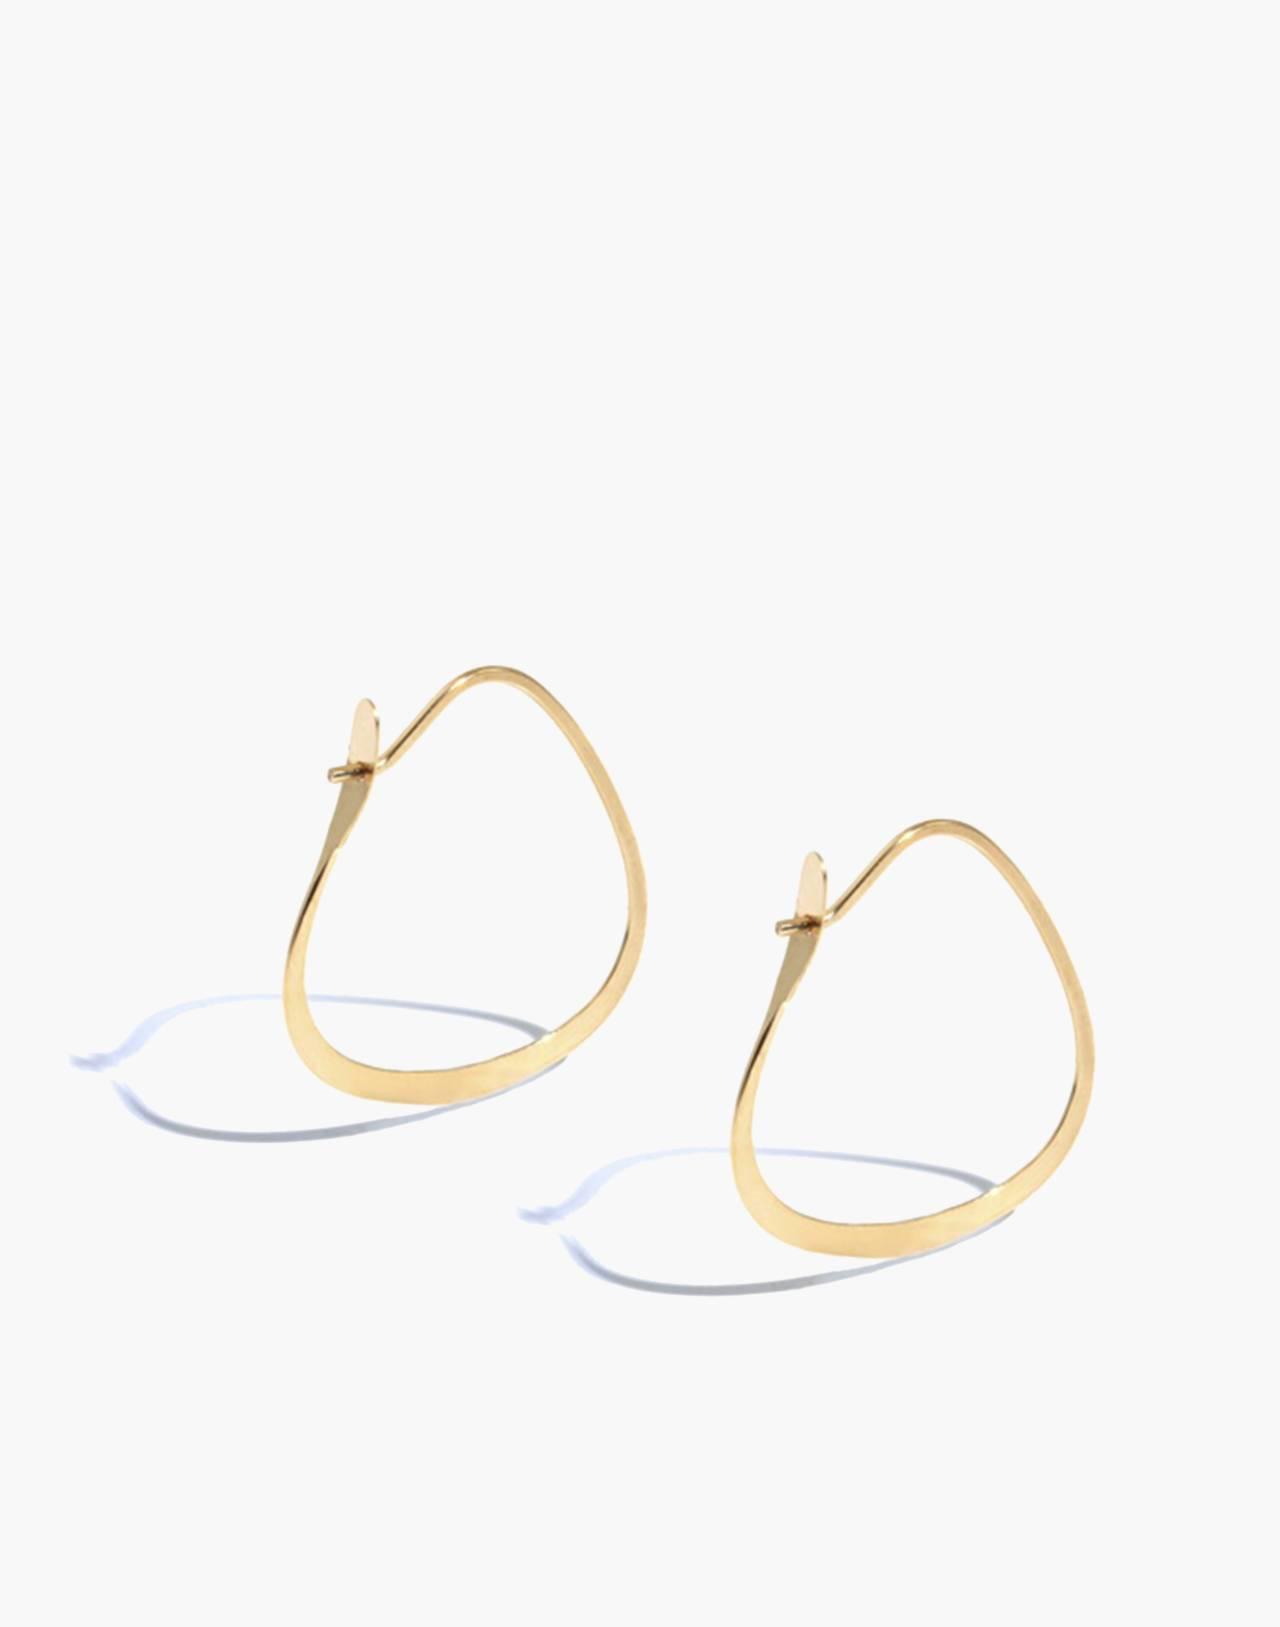 Melissa Joy Manning® 14k Gold Triangle Hoop Earrings in gold image 1